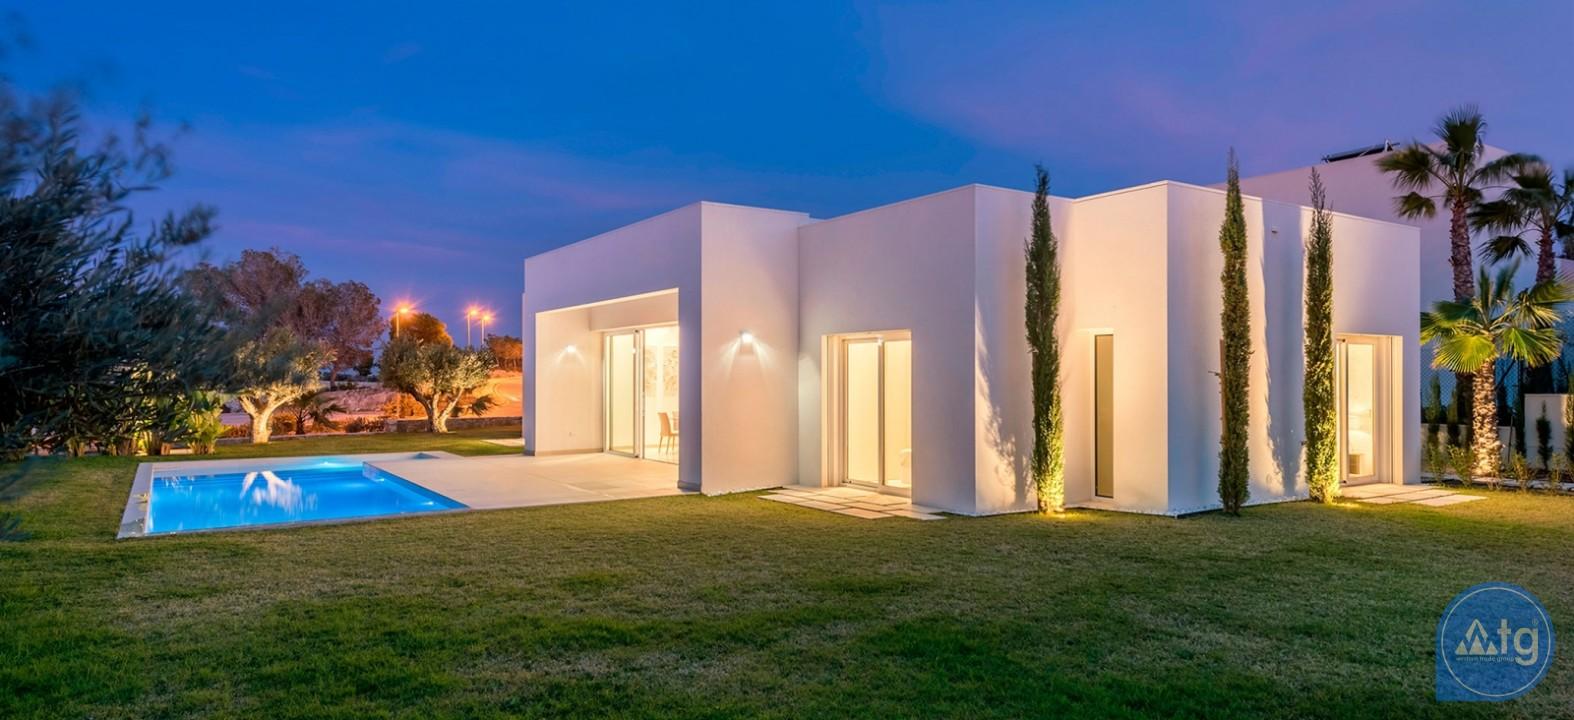 Bungalow de 3 chambres à Pilar de la Horadada - SR2619 - 4